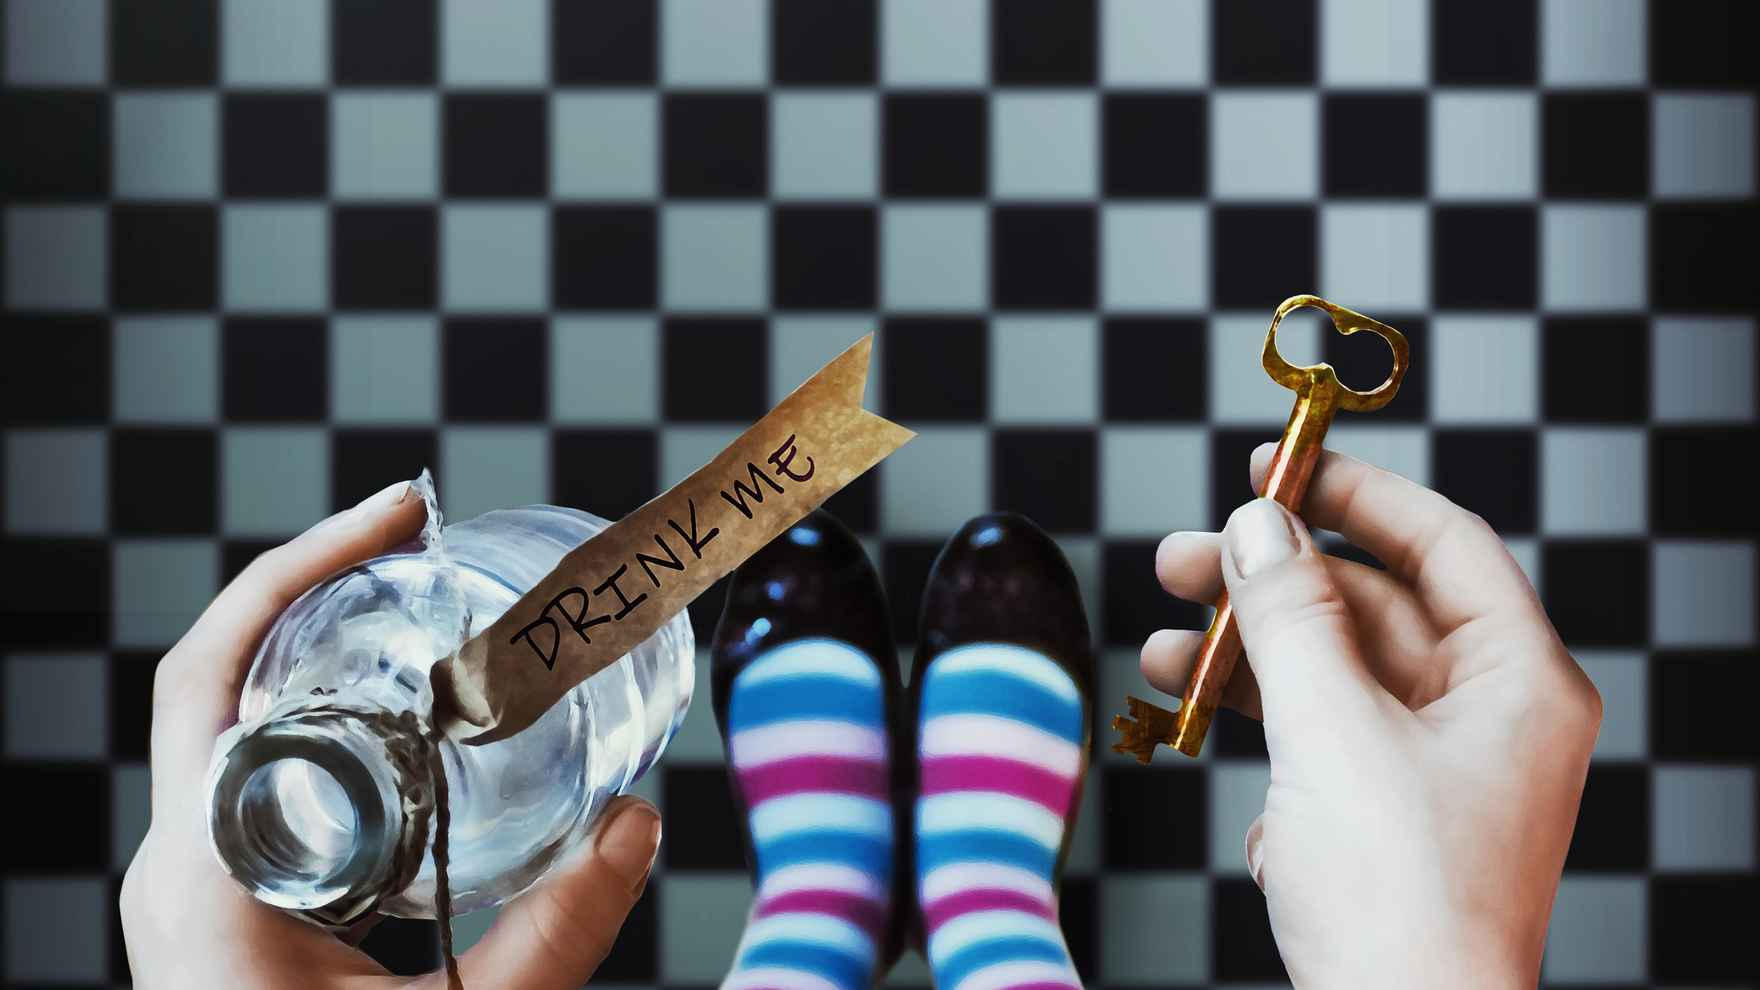 alice-in-wonderland-drink-me-key-checkered-floor-sm